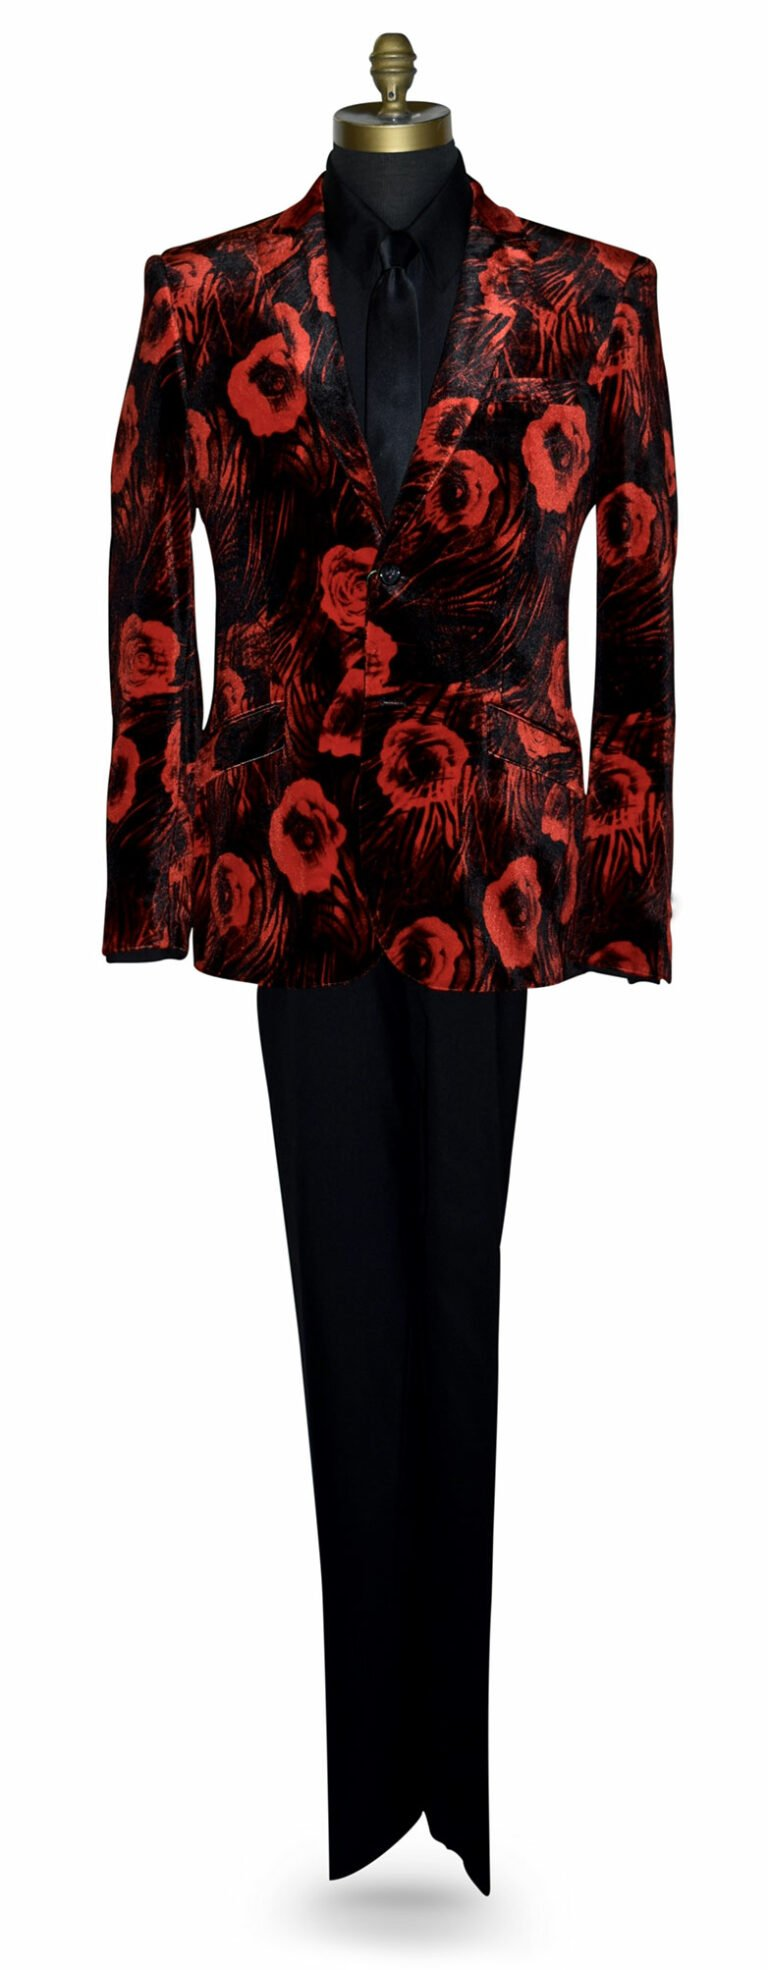 Red Velvet Tuxedo Jacket with Floral Print